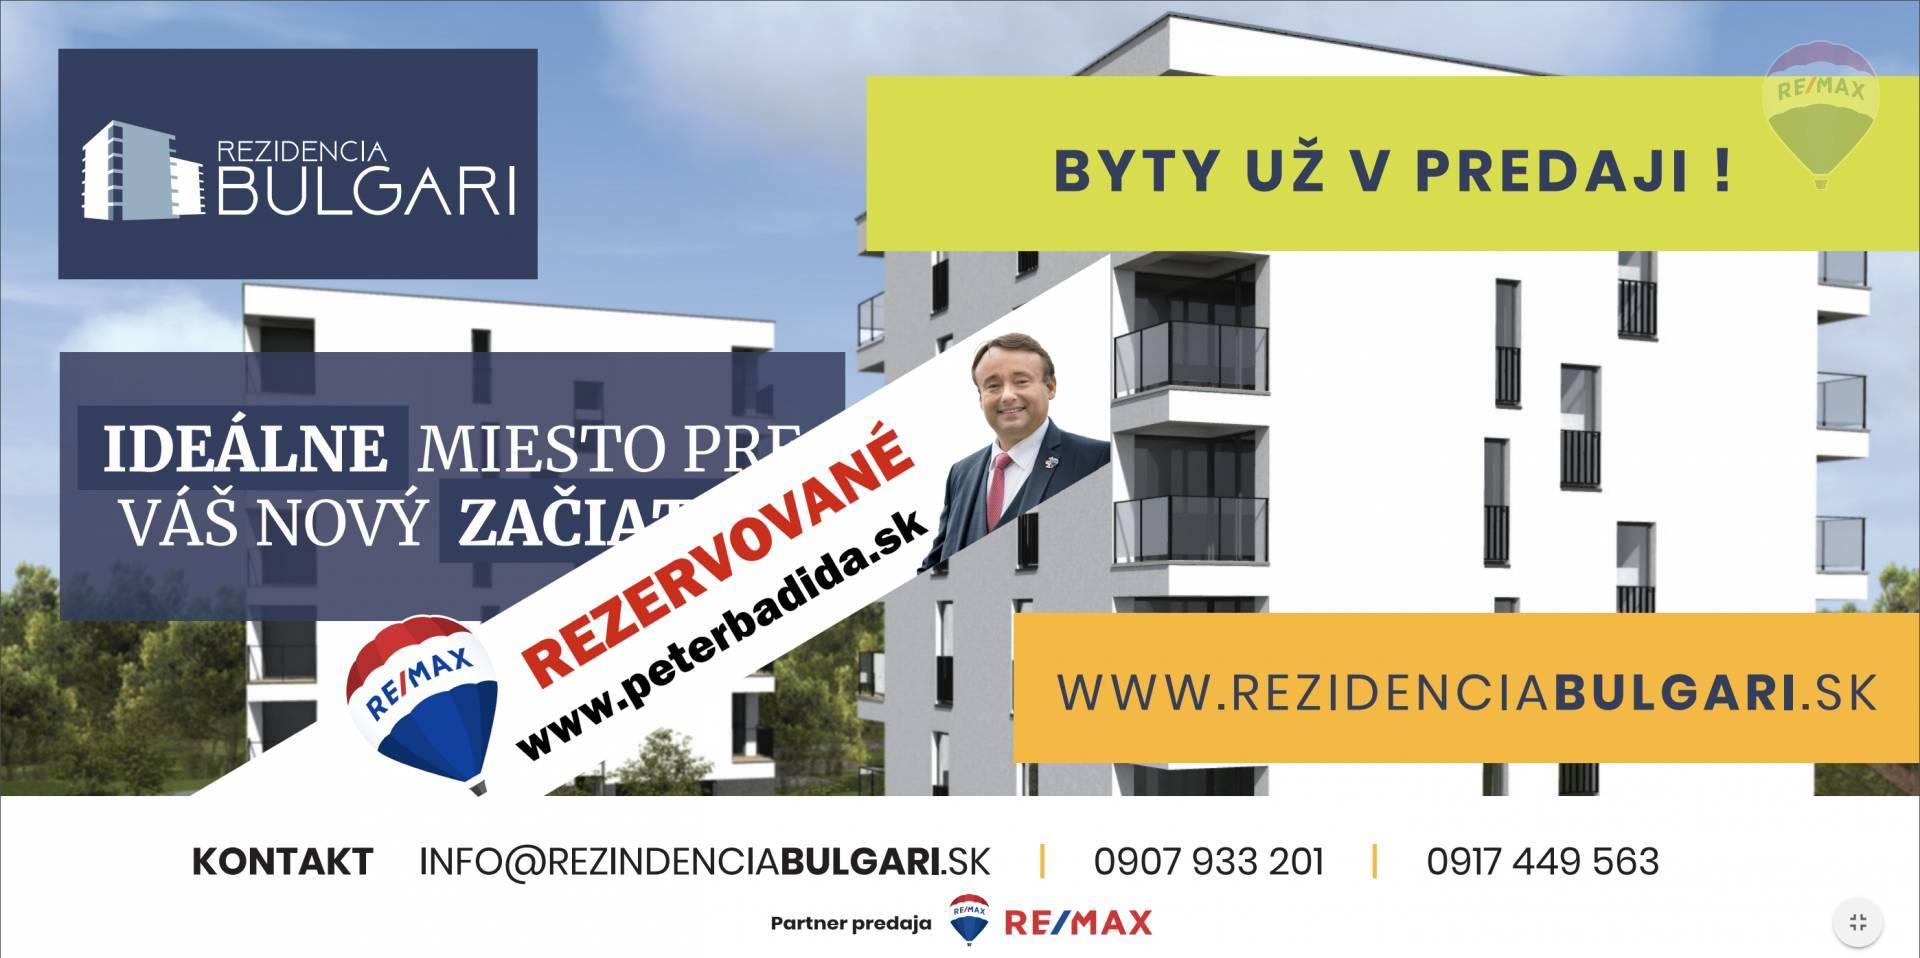 --- R E Z E R V O V A N É --- Na predaj 1 izbový byt Bulharská ulica v Prešove